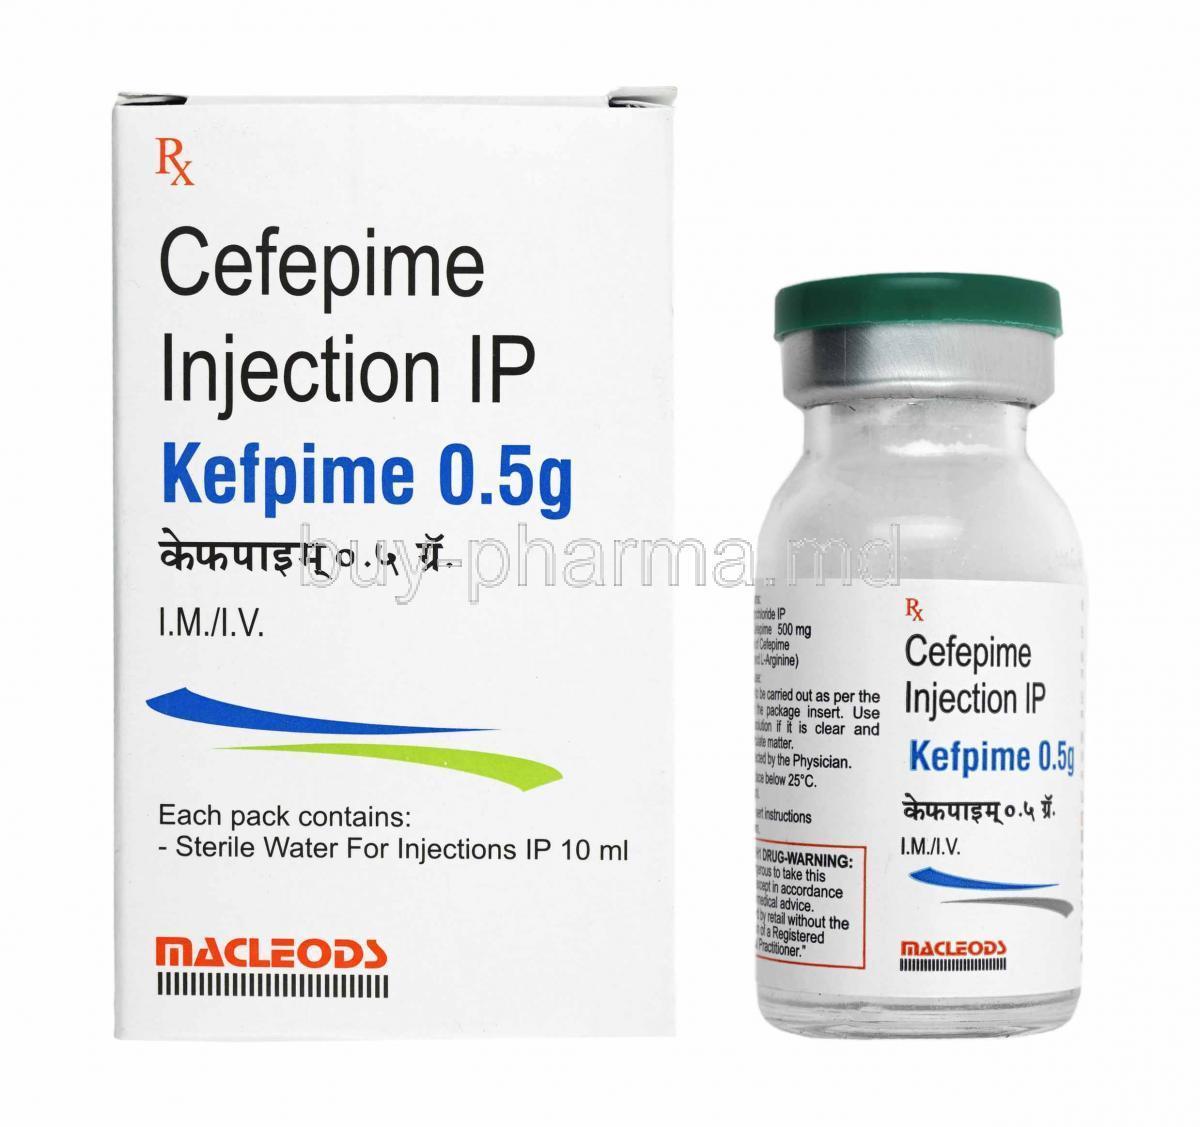 Cefepime Injection